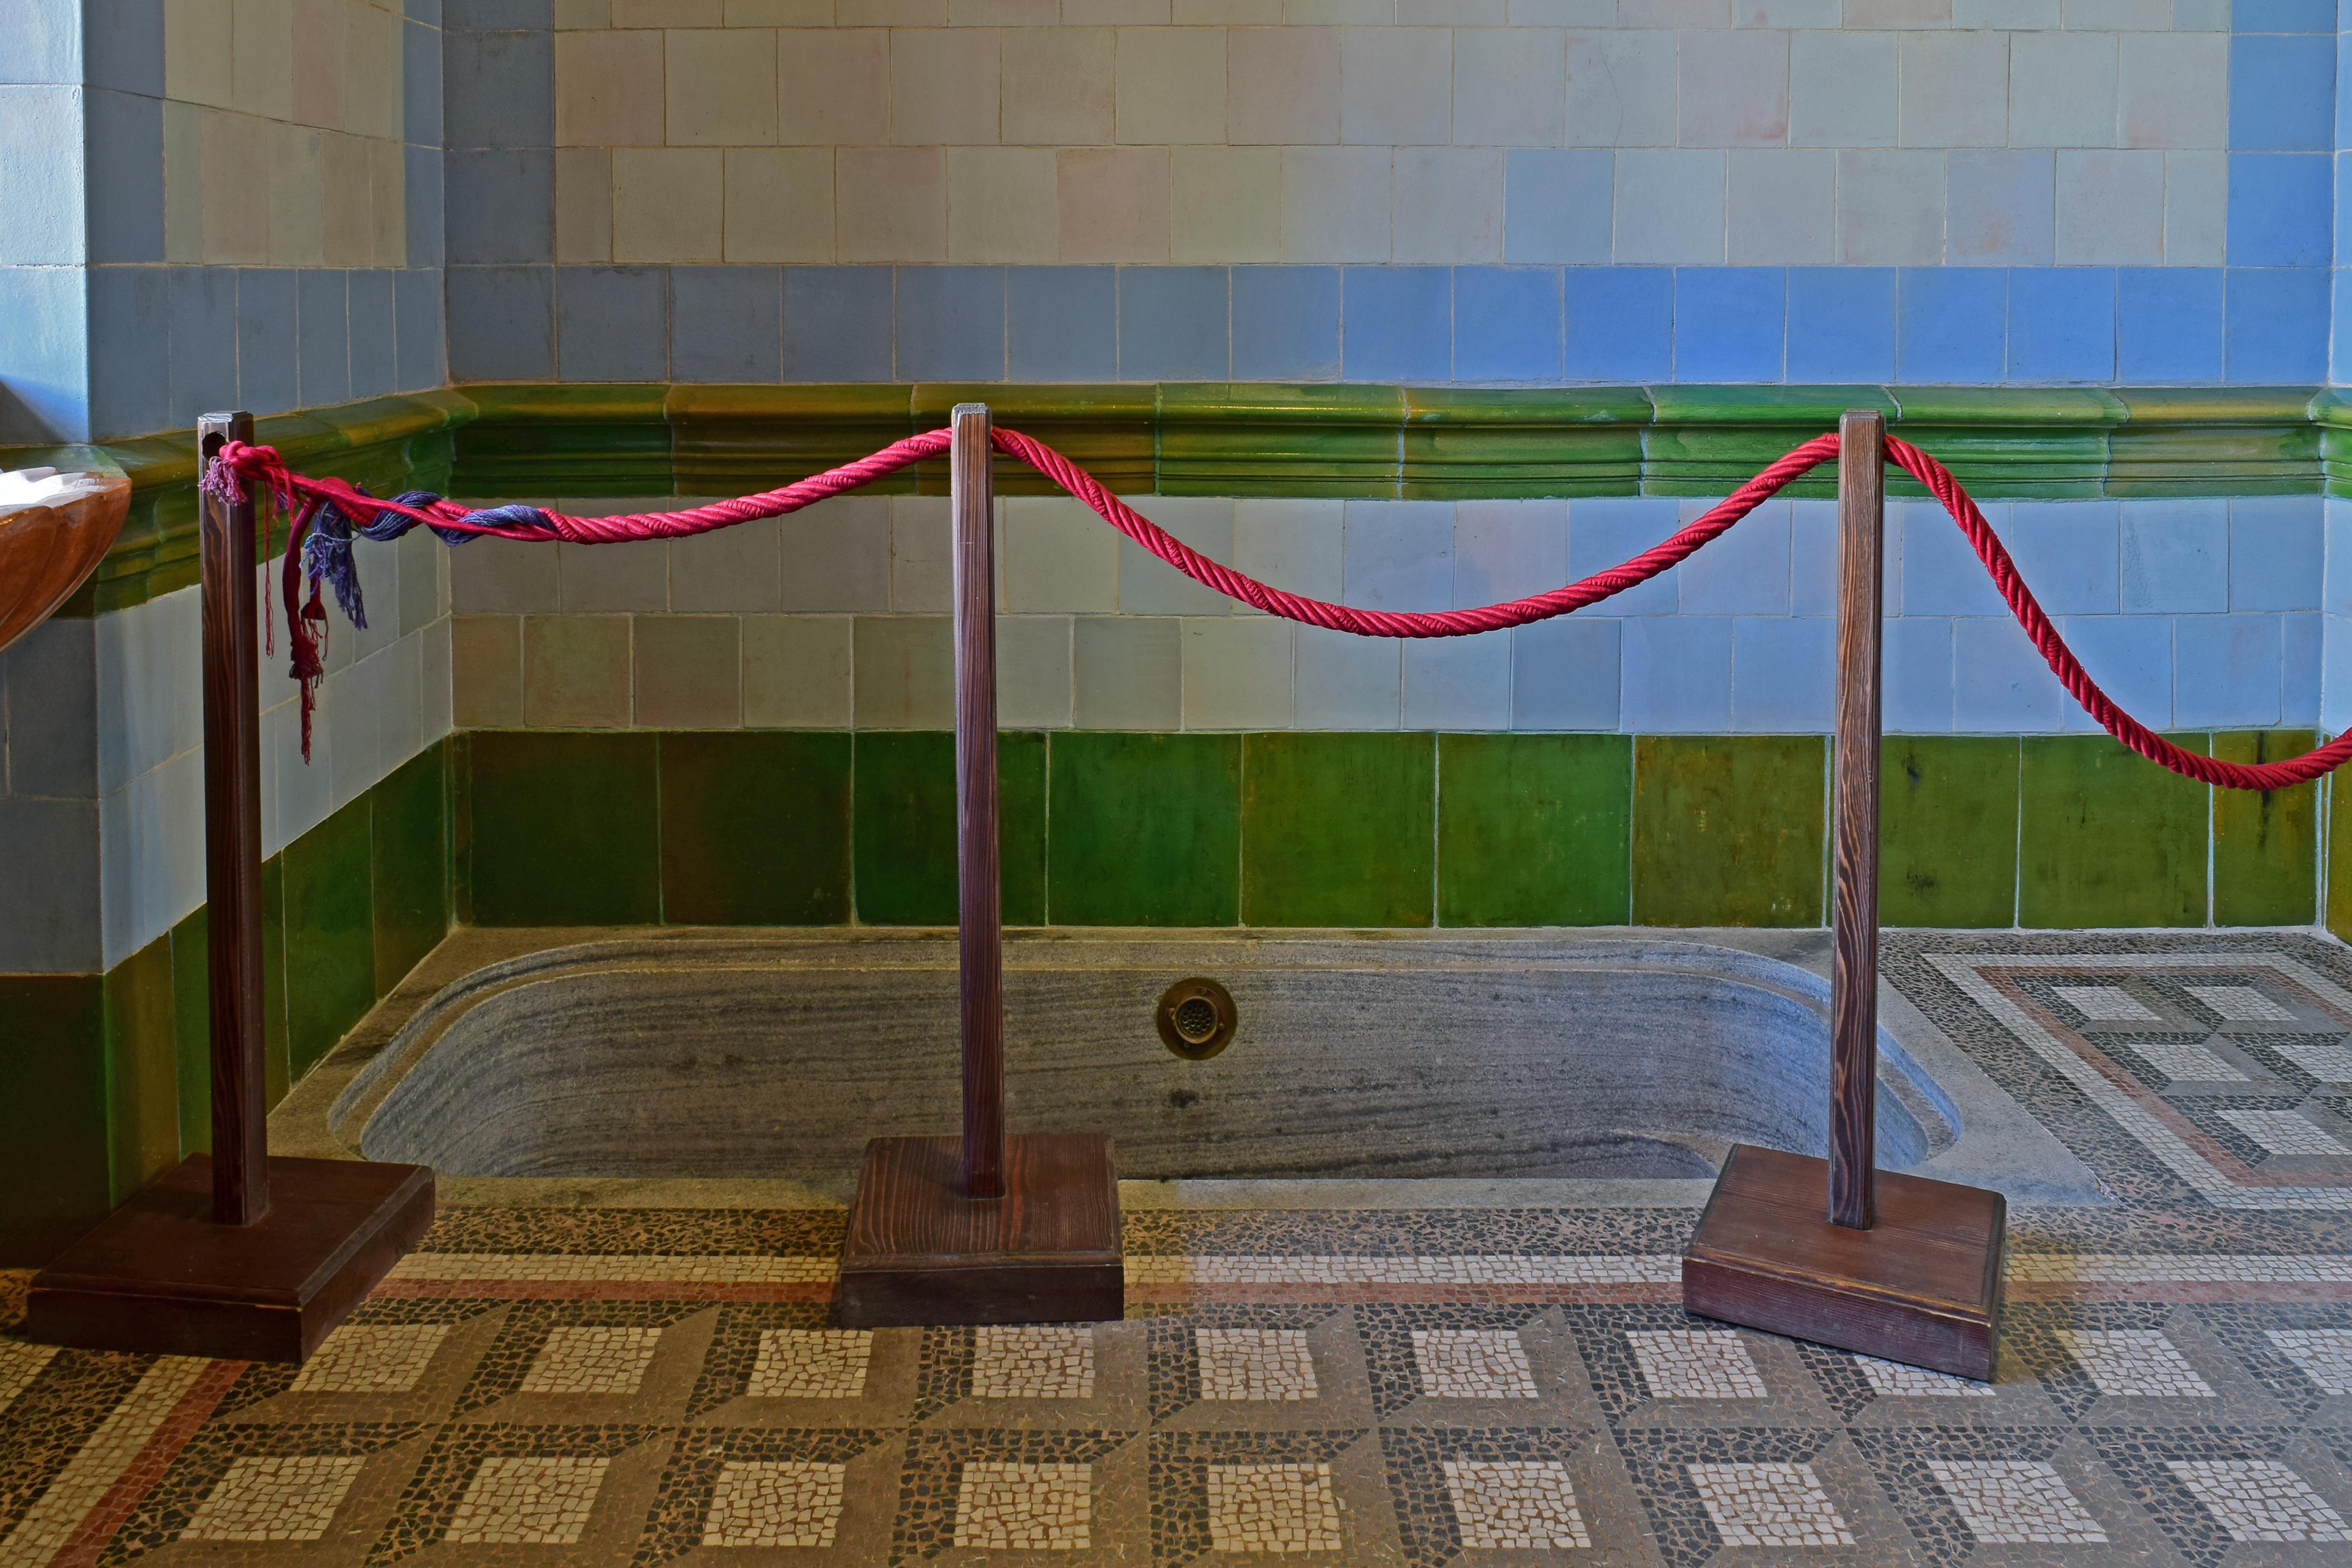 file:schloss grafenegg - badezimmer - badewanne - wikimedia